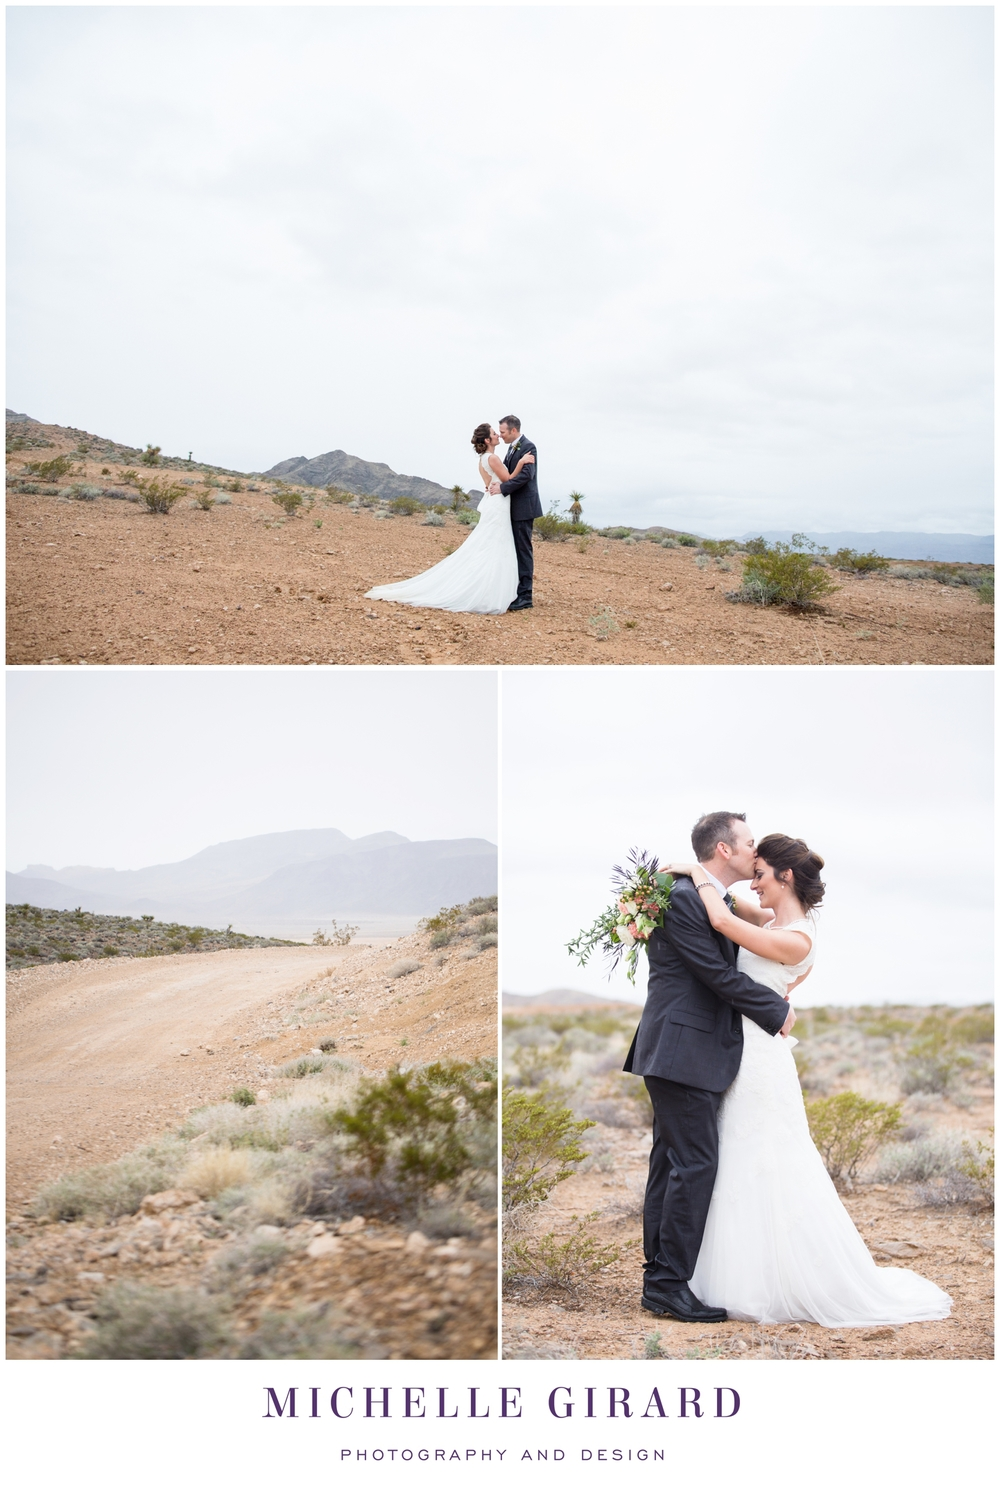 las-vegas-desert-wedding-bride-groom-photography-nevada-michelle-girard-09.jpg